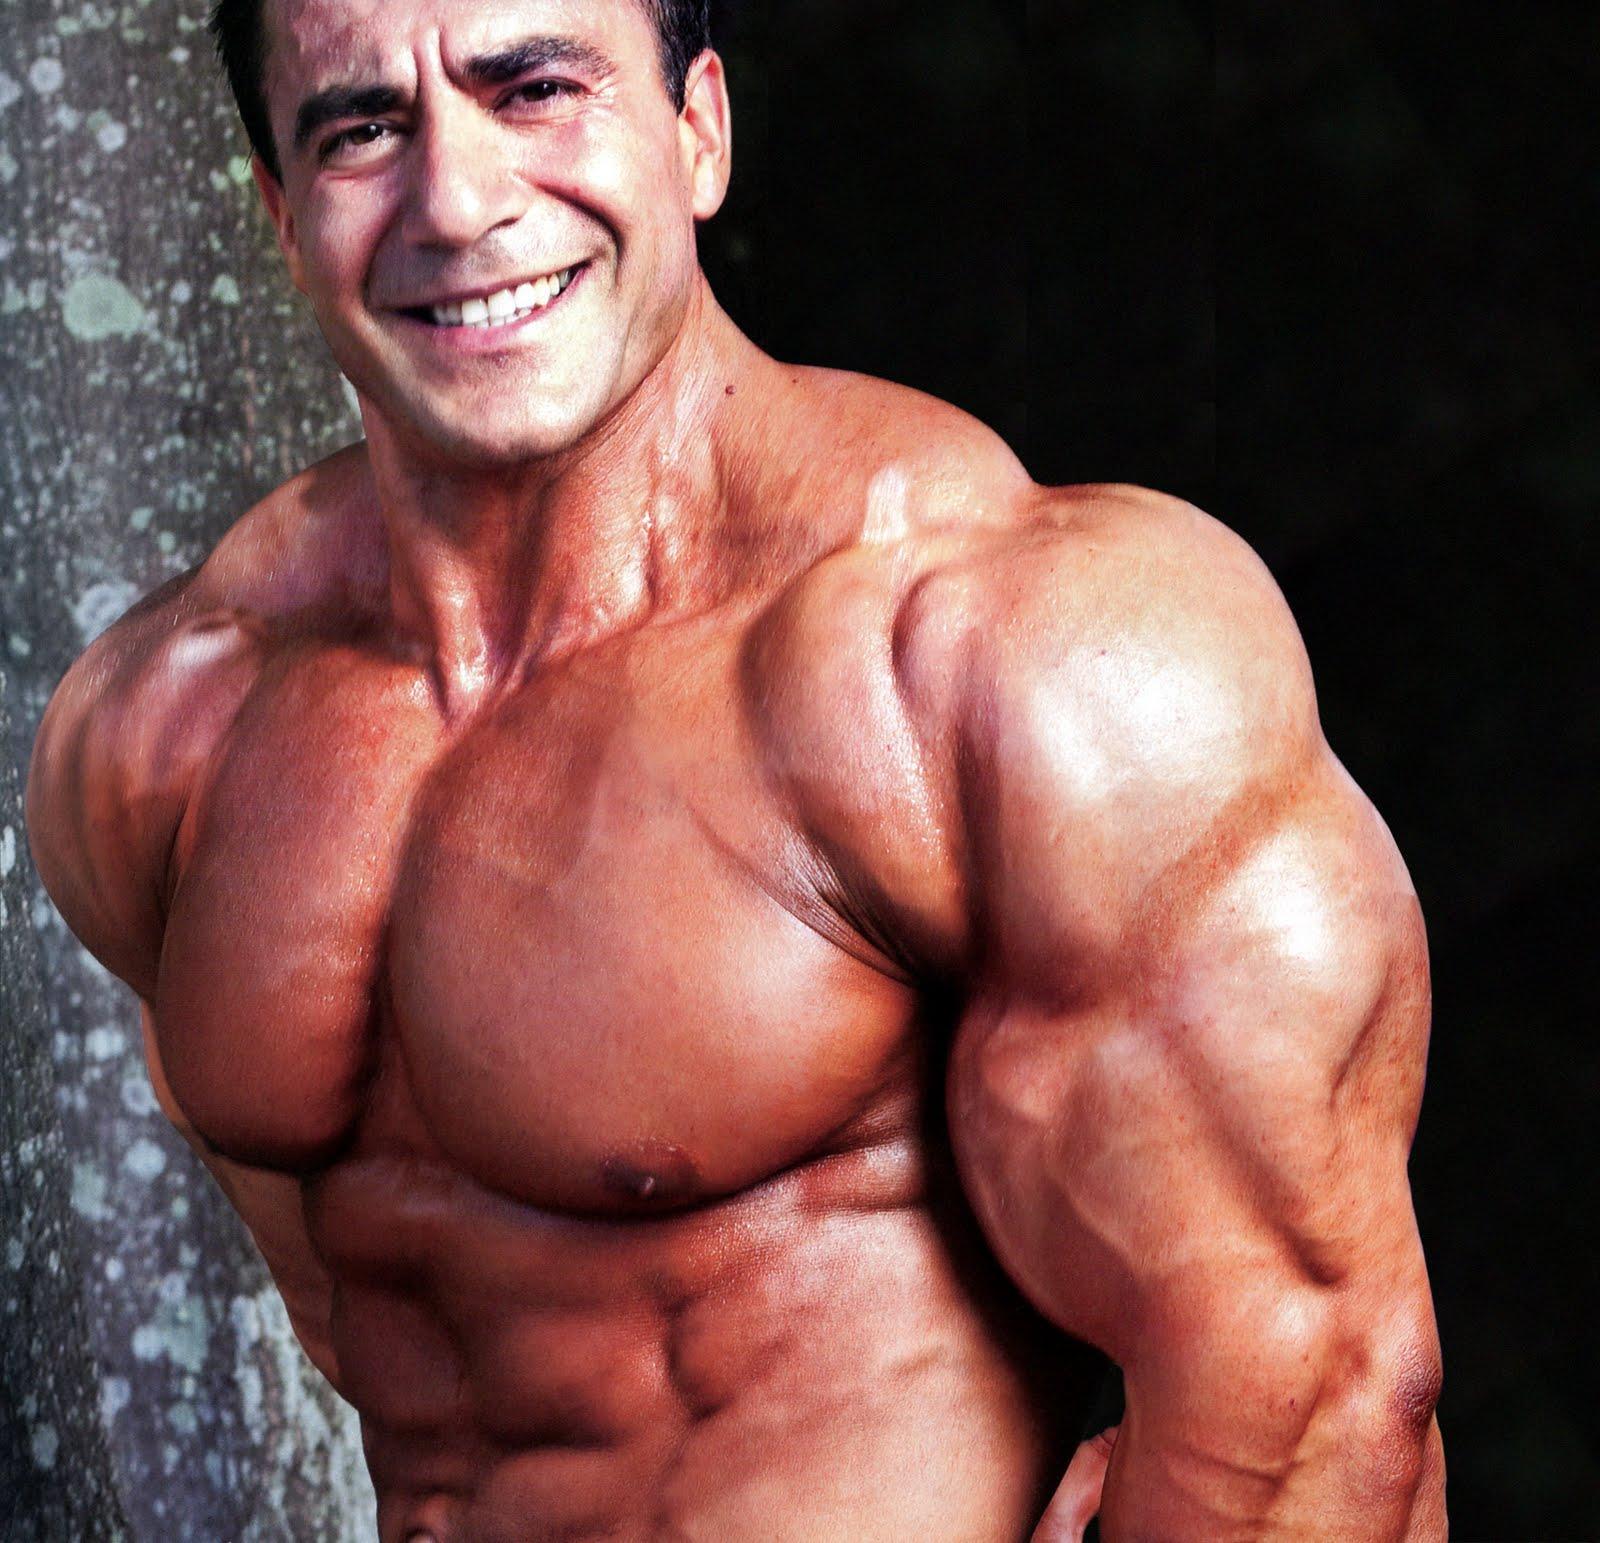 Grigori Atoyan, IFBB Pro Bodybuilder